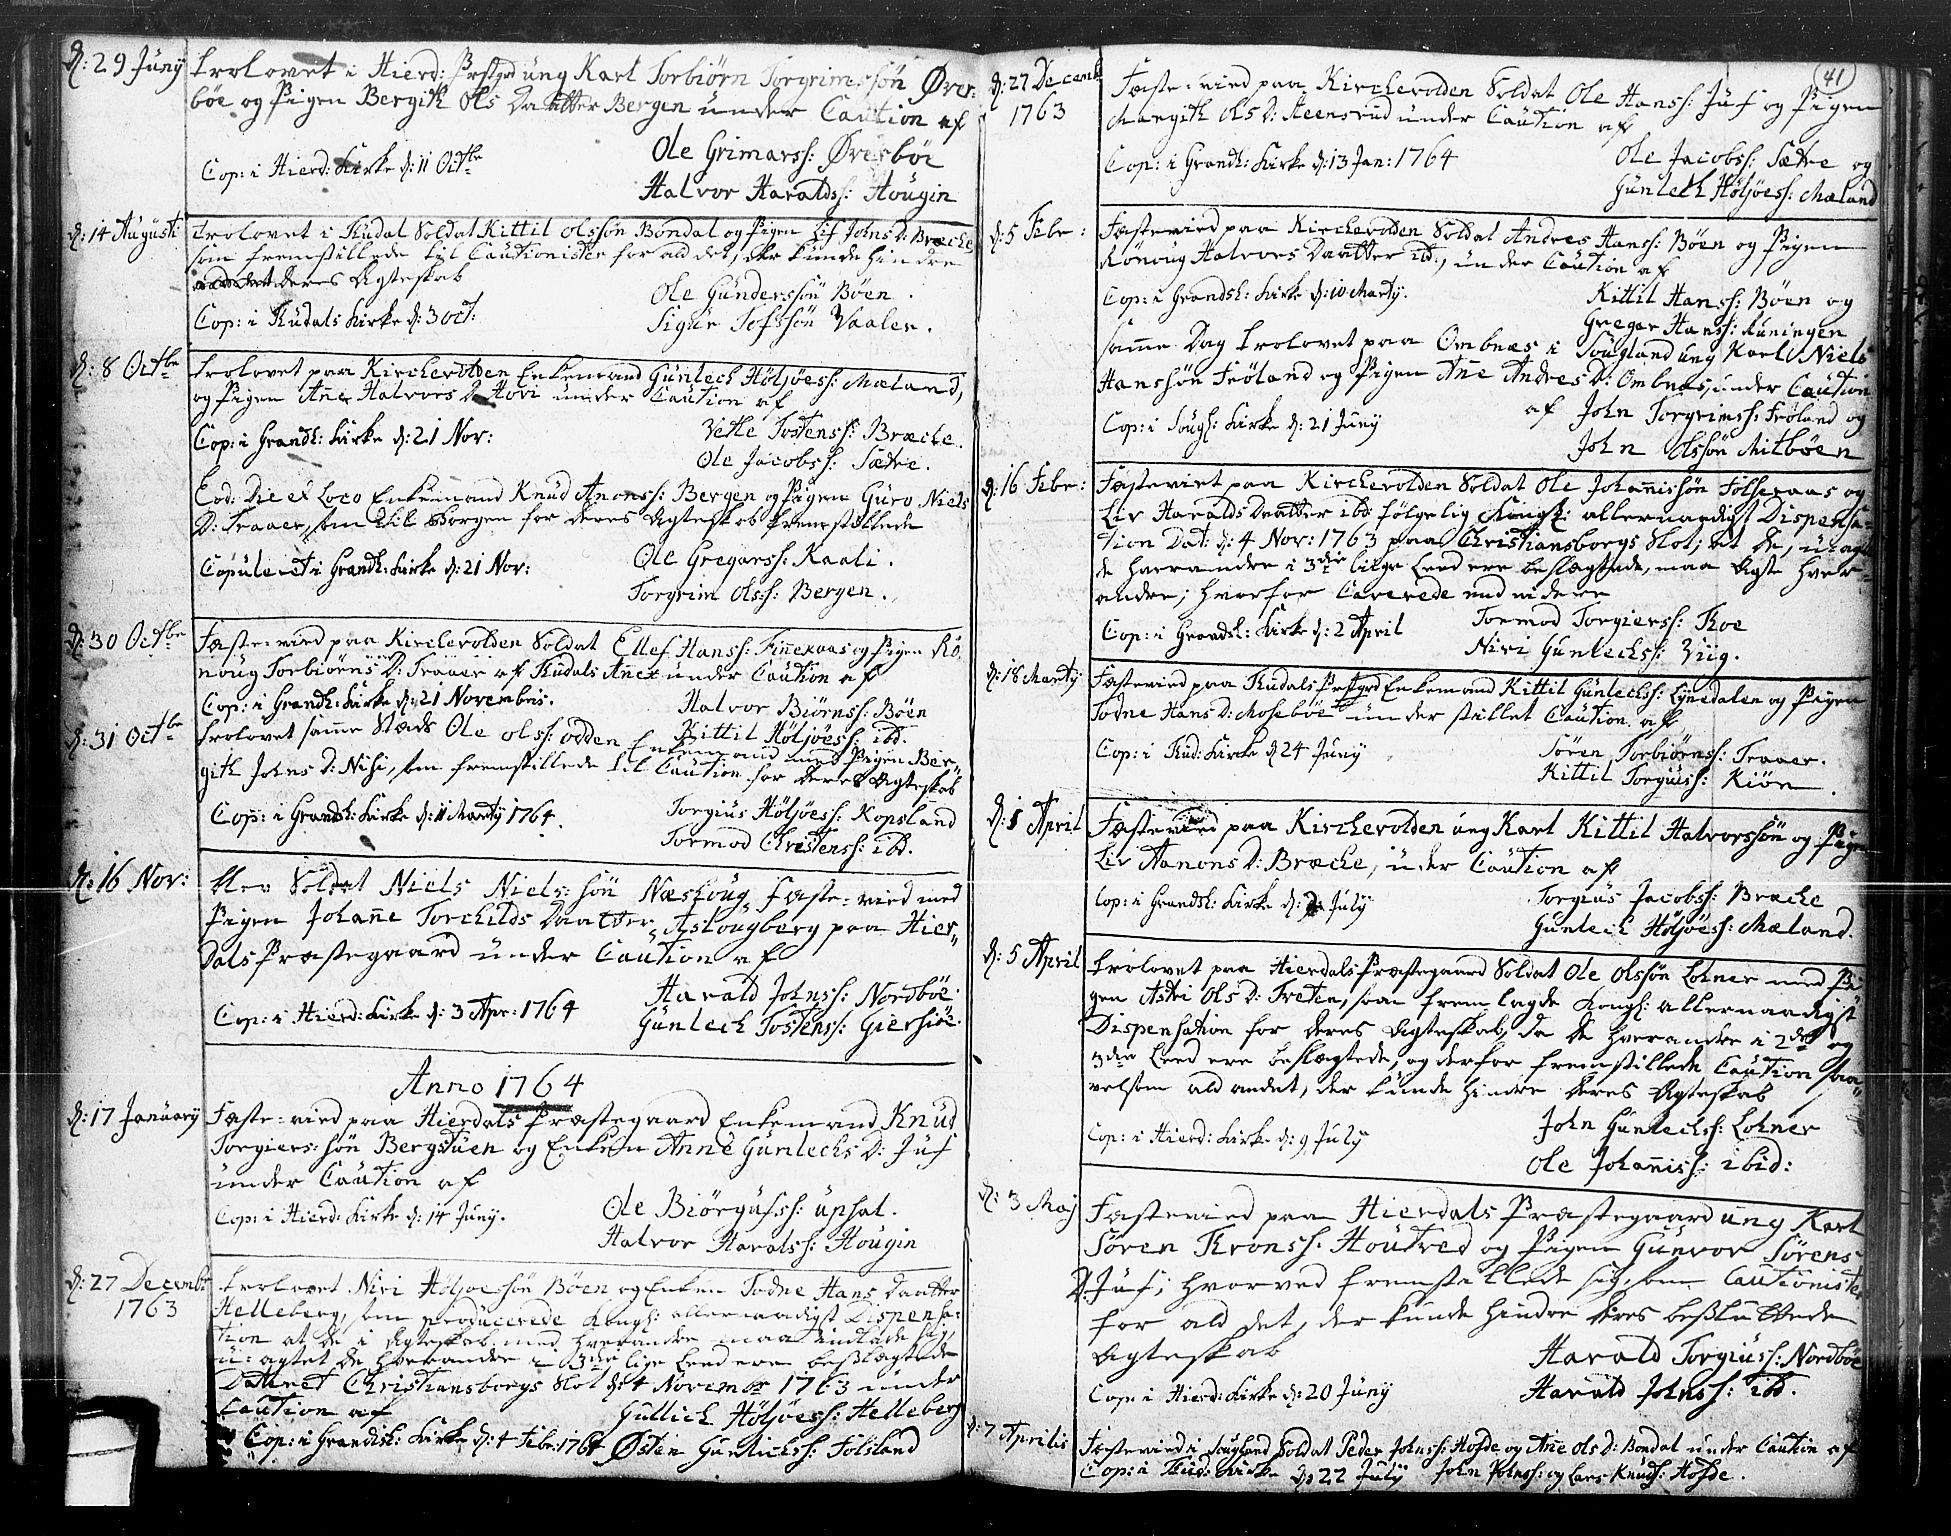 SAKO, Hjartdal kirkebøker, F/Fa/L0004: Ministerialbok nr. I 4, 1727-1795, s. 41